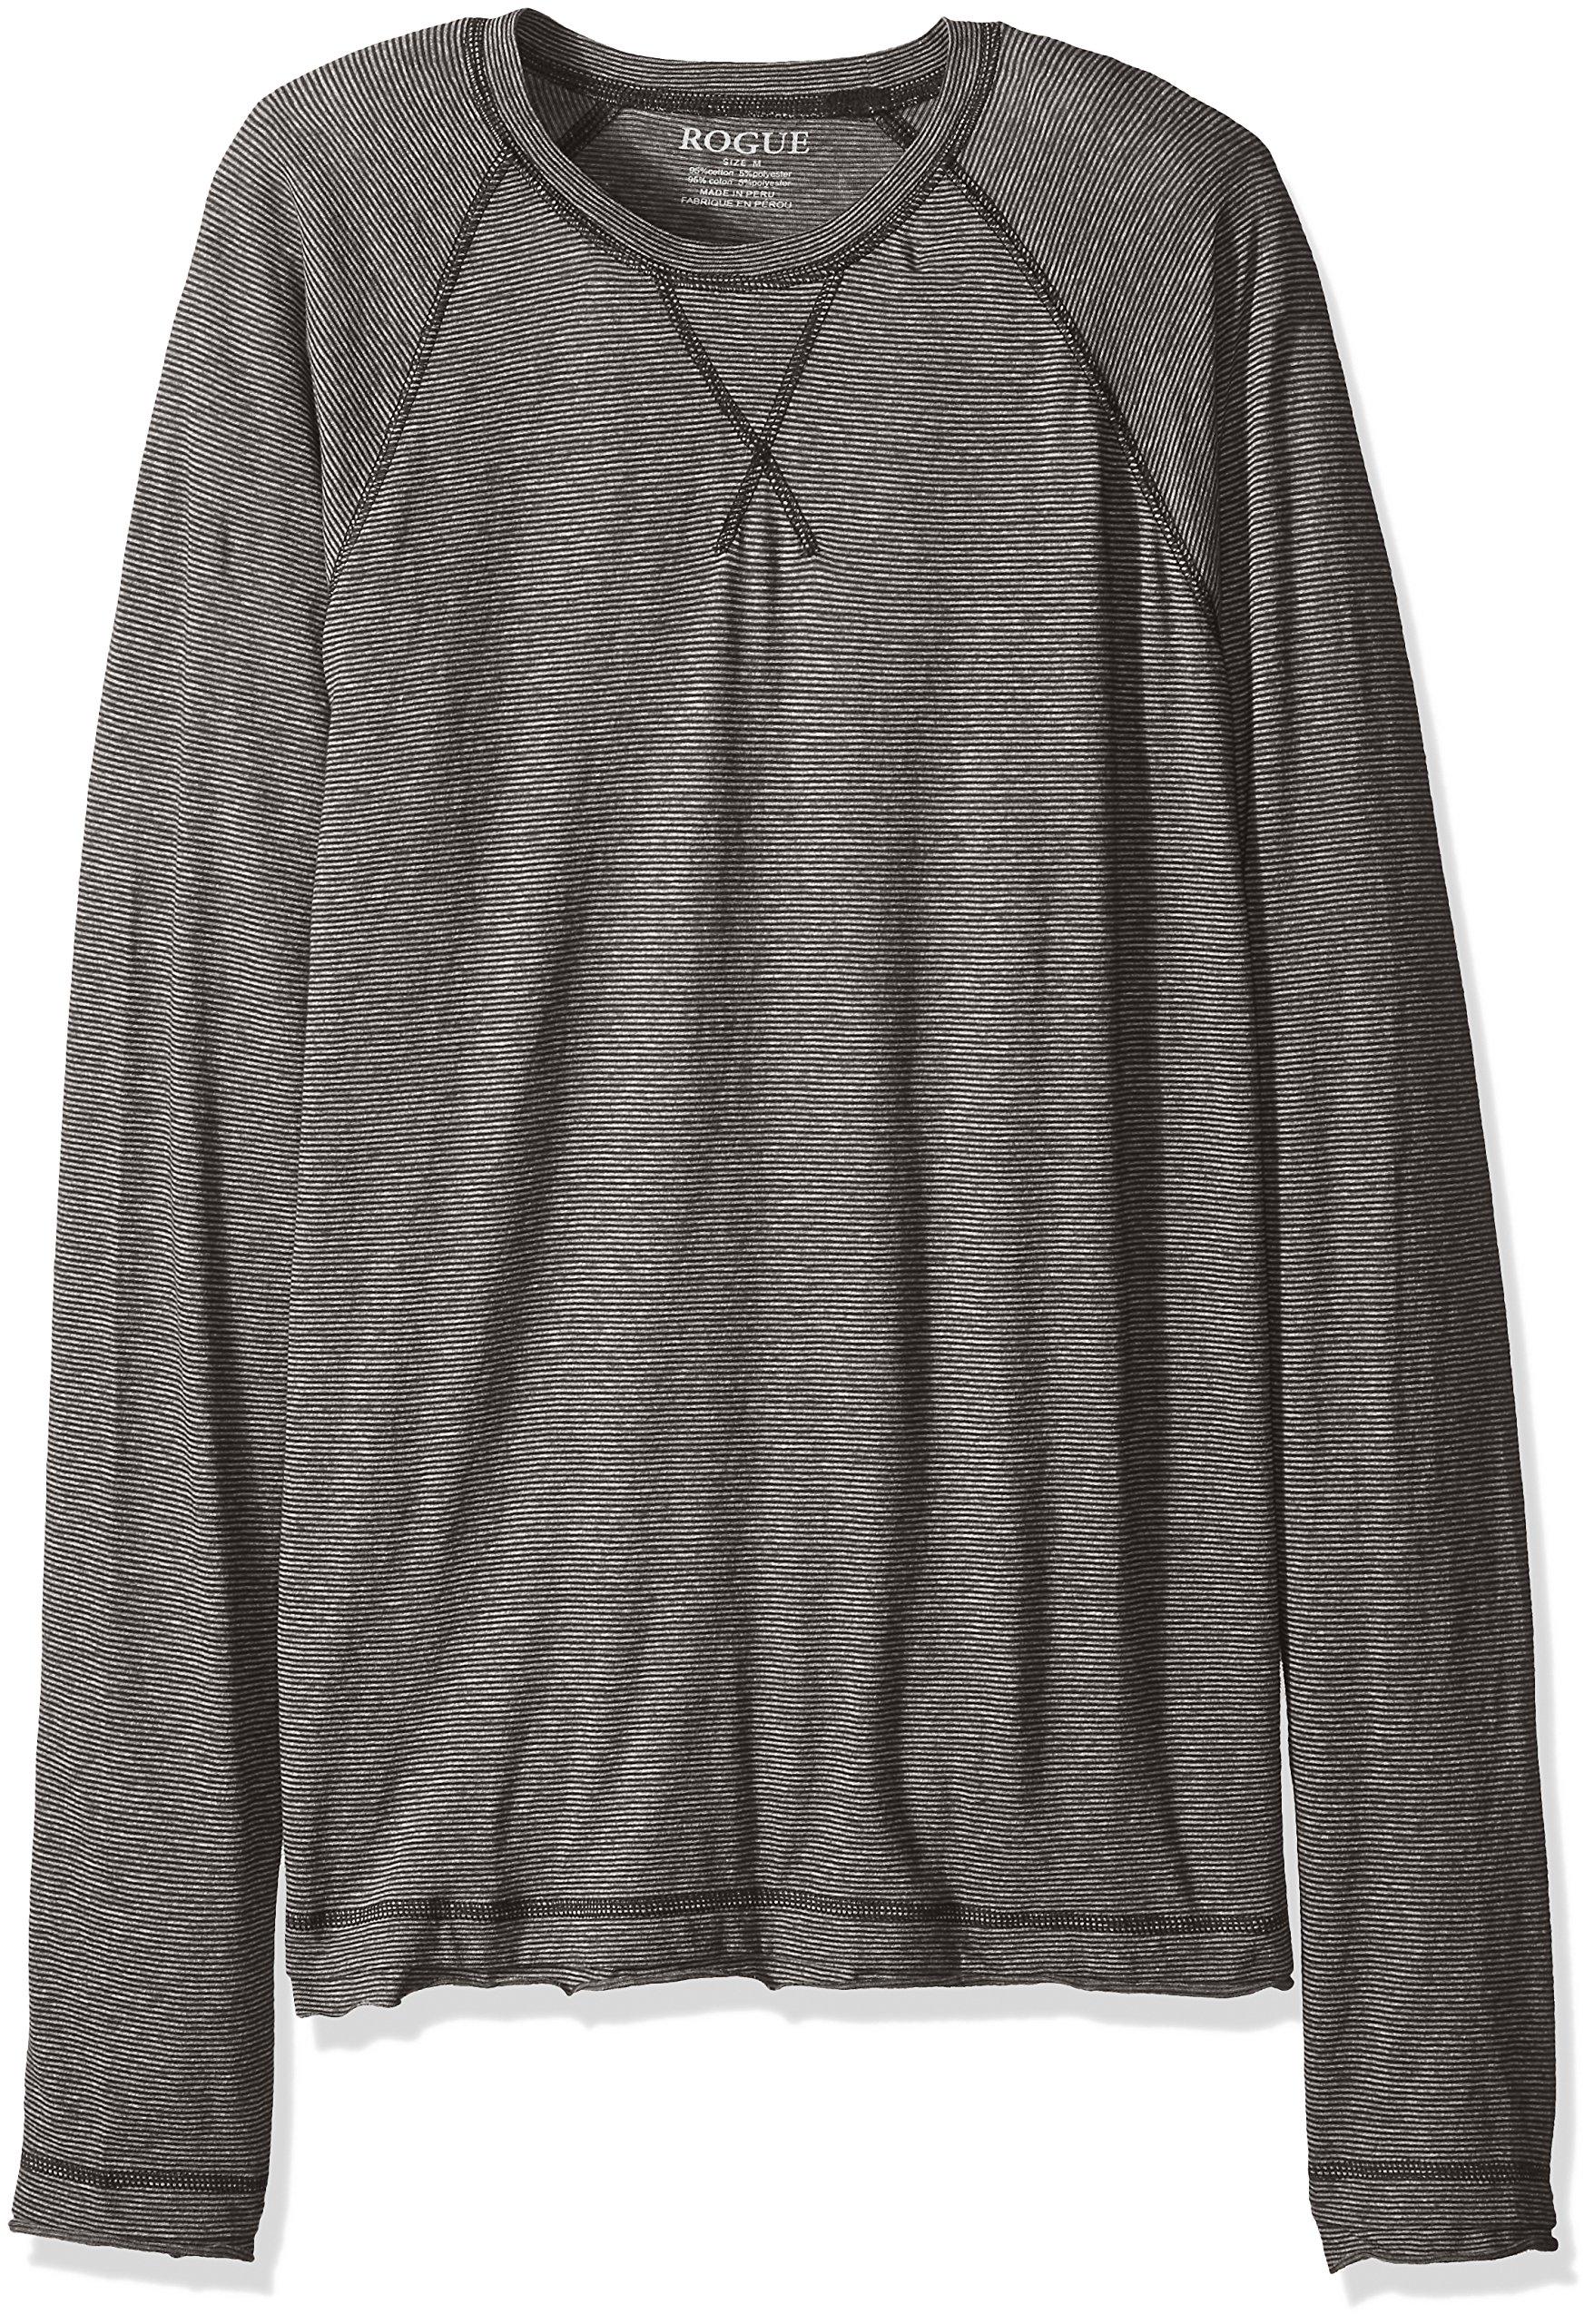 ROGUE Men's Long Sleeve Striped T-Shirt, Black/Charcoal, Large